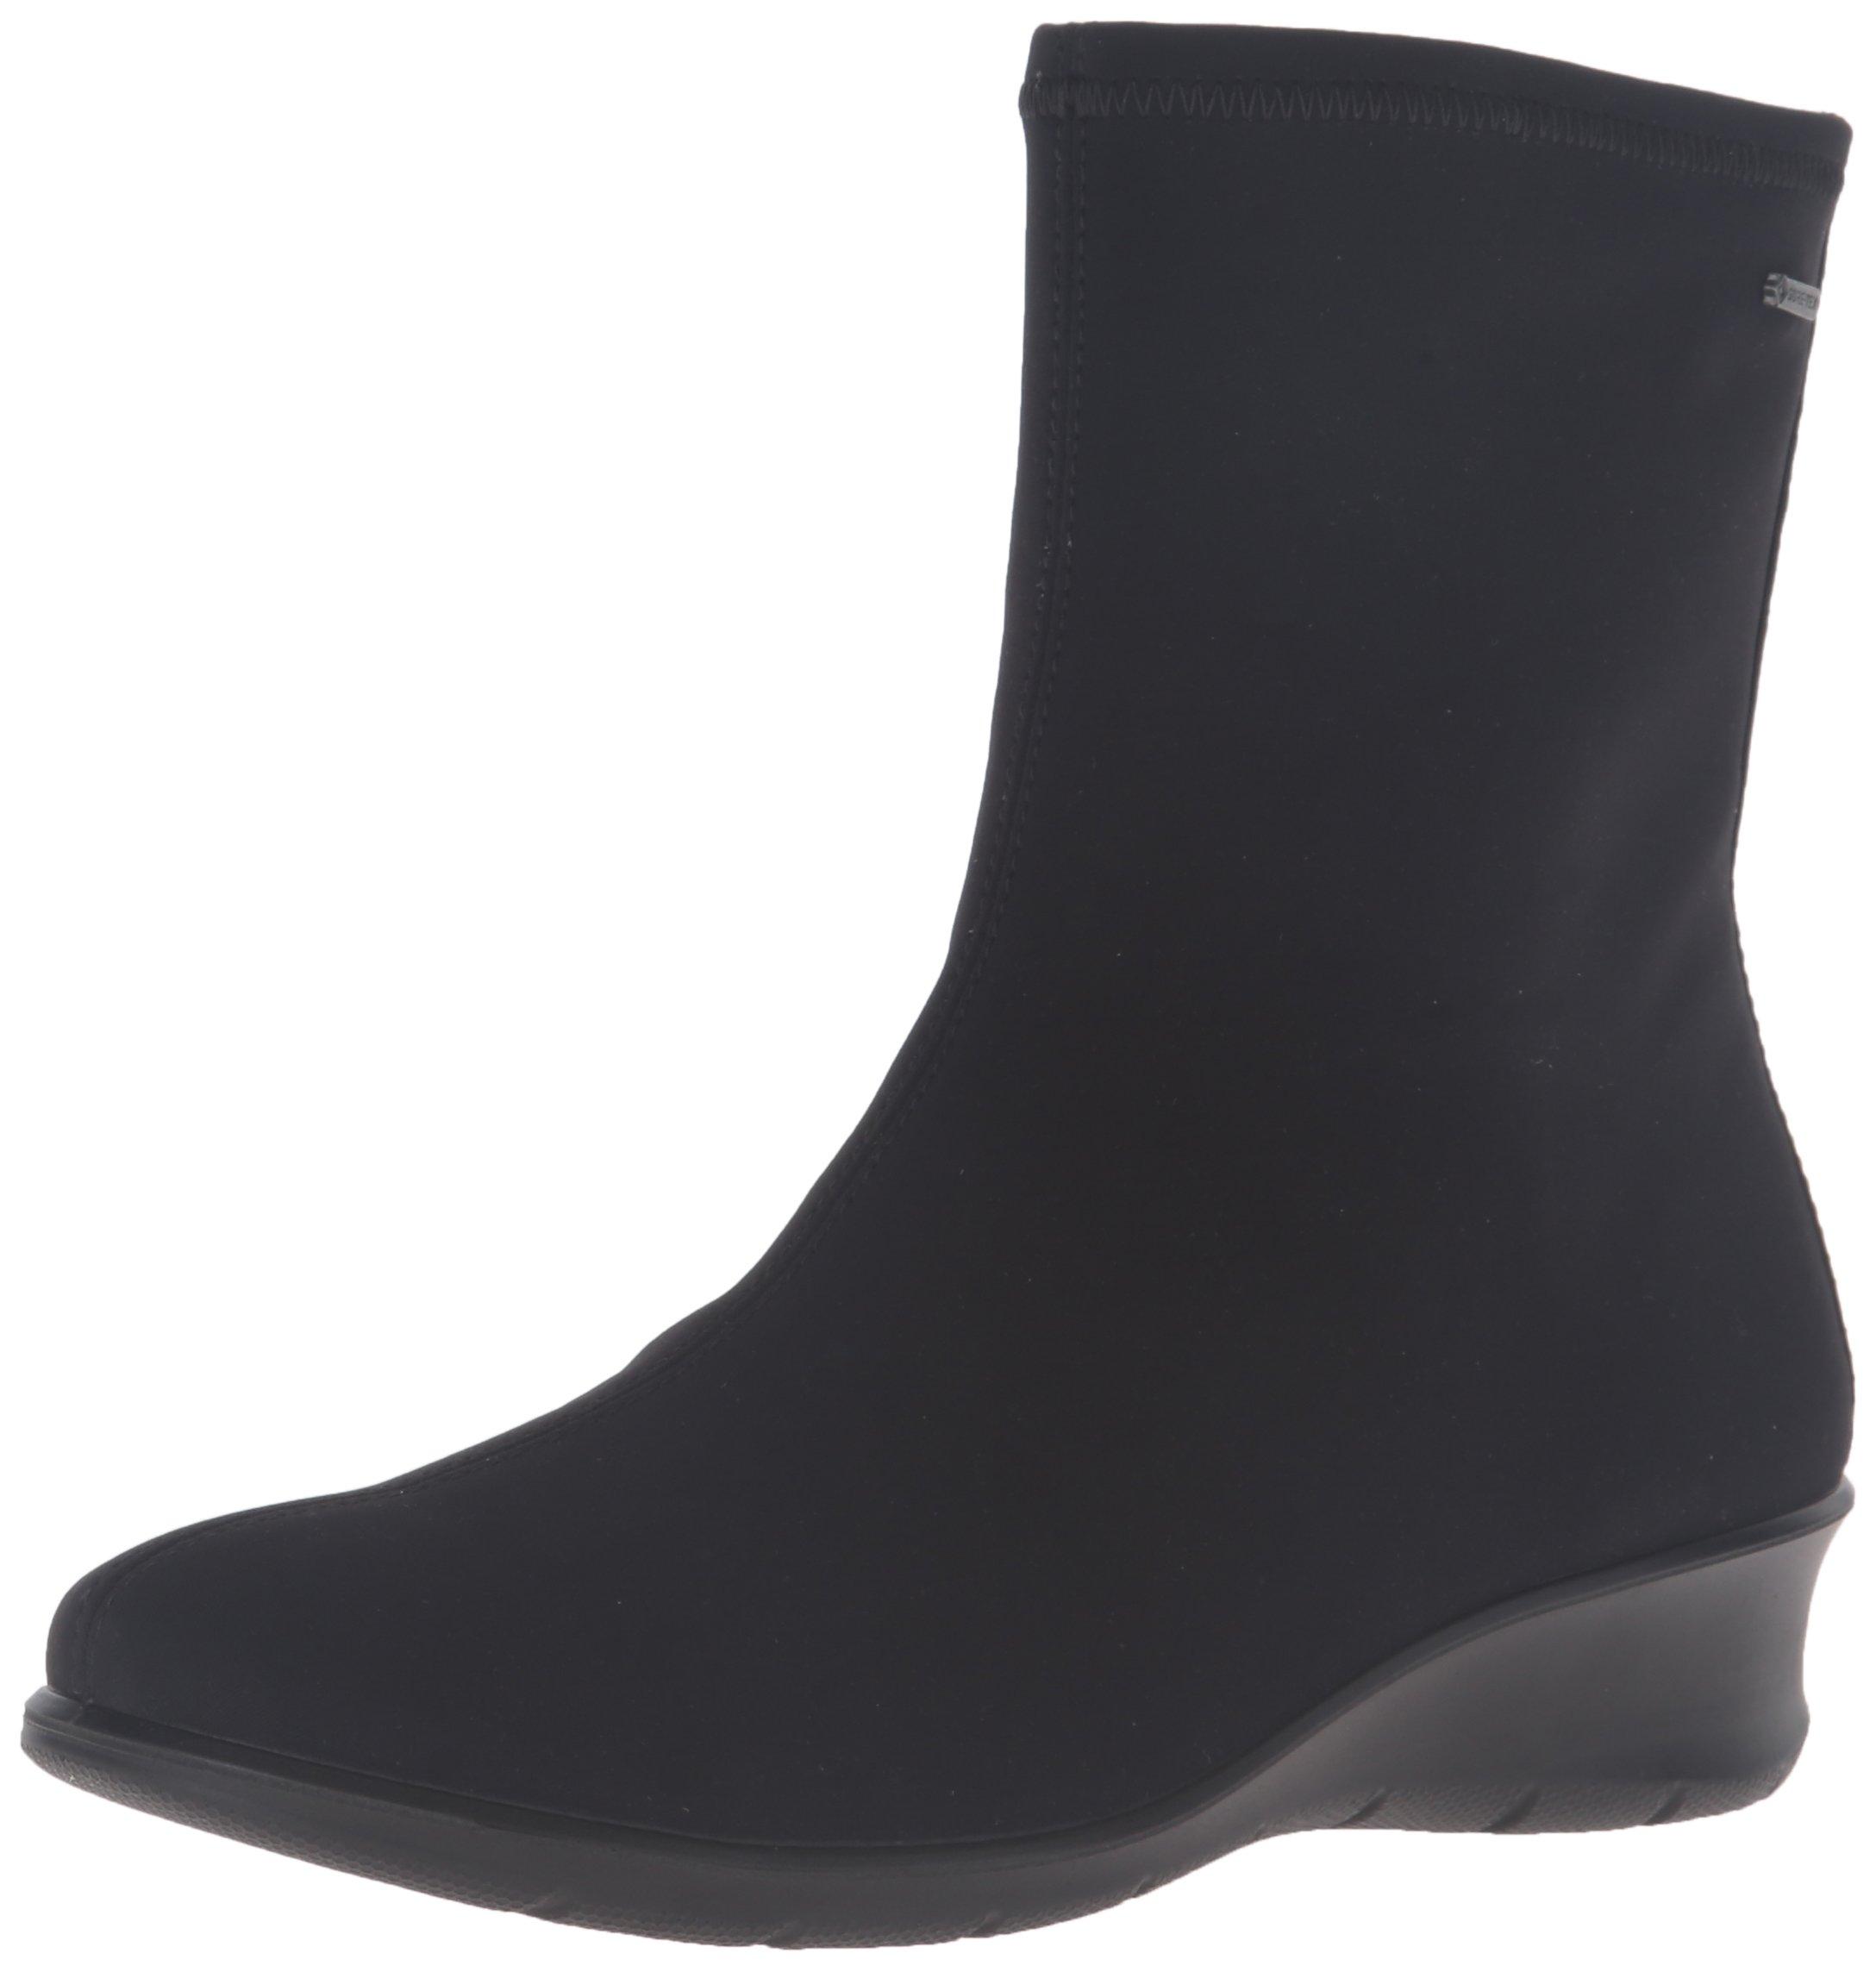 ECCO Women's Women's Felicia Gore-Tex Boot, Black Textile, 39 EU/8-8.5 M US